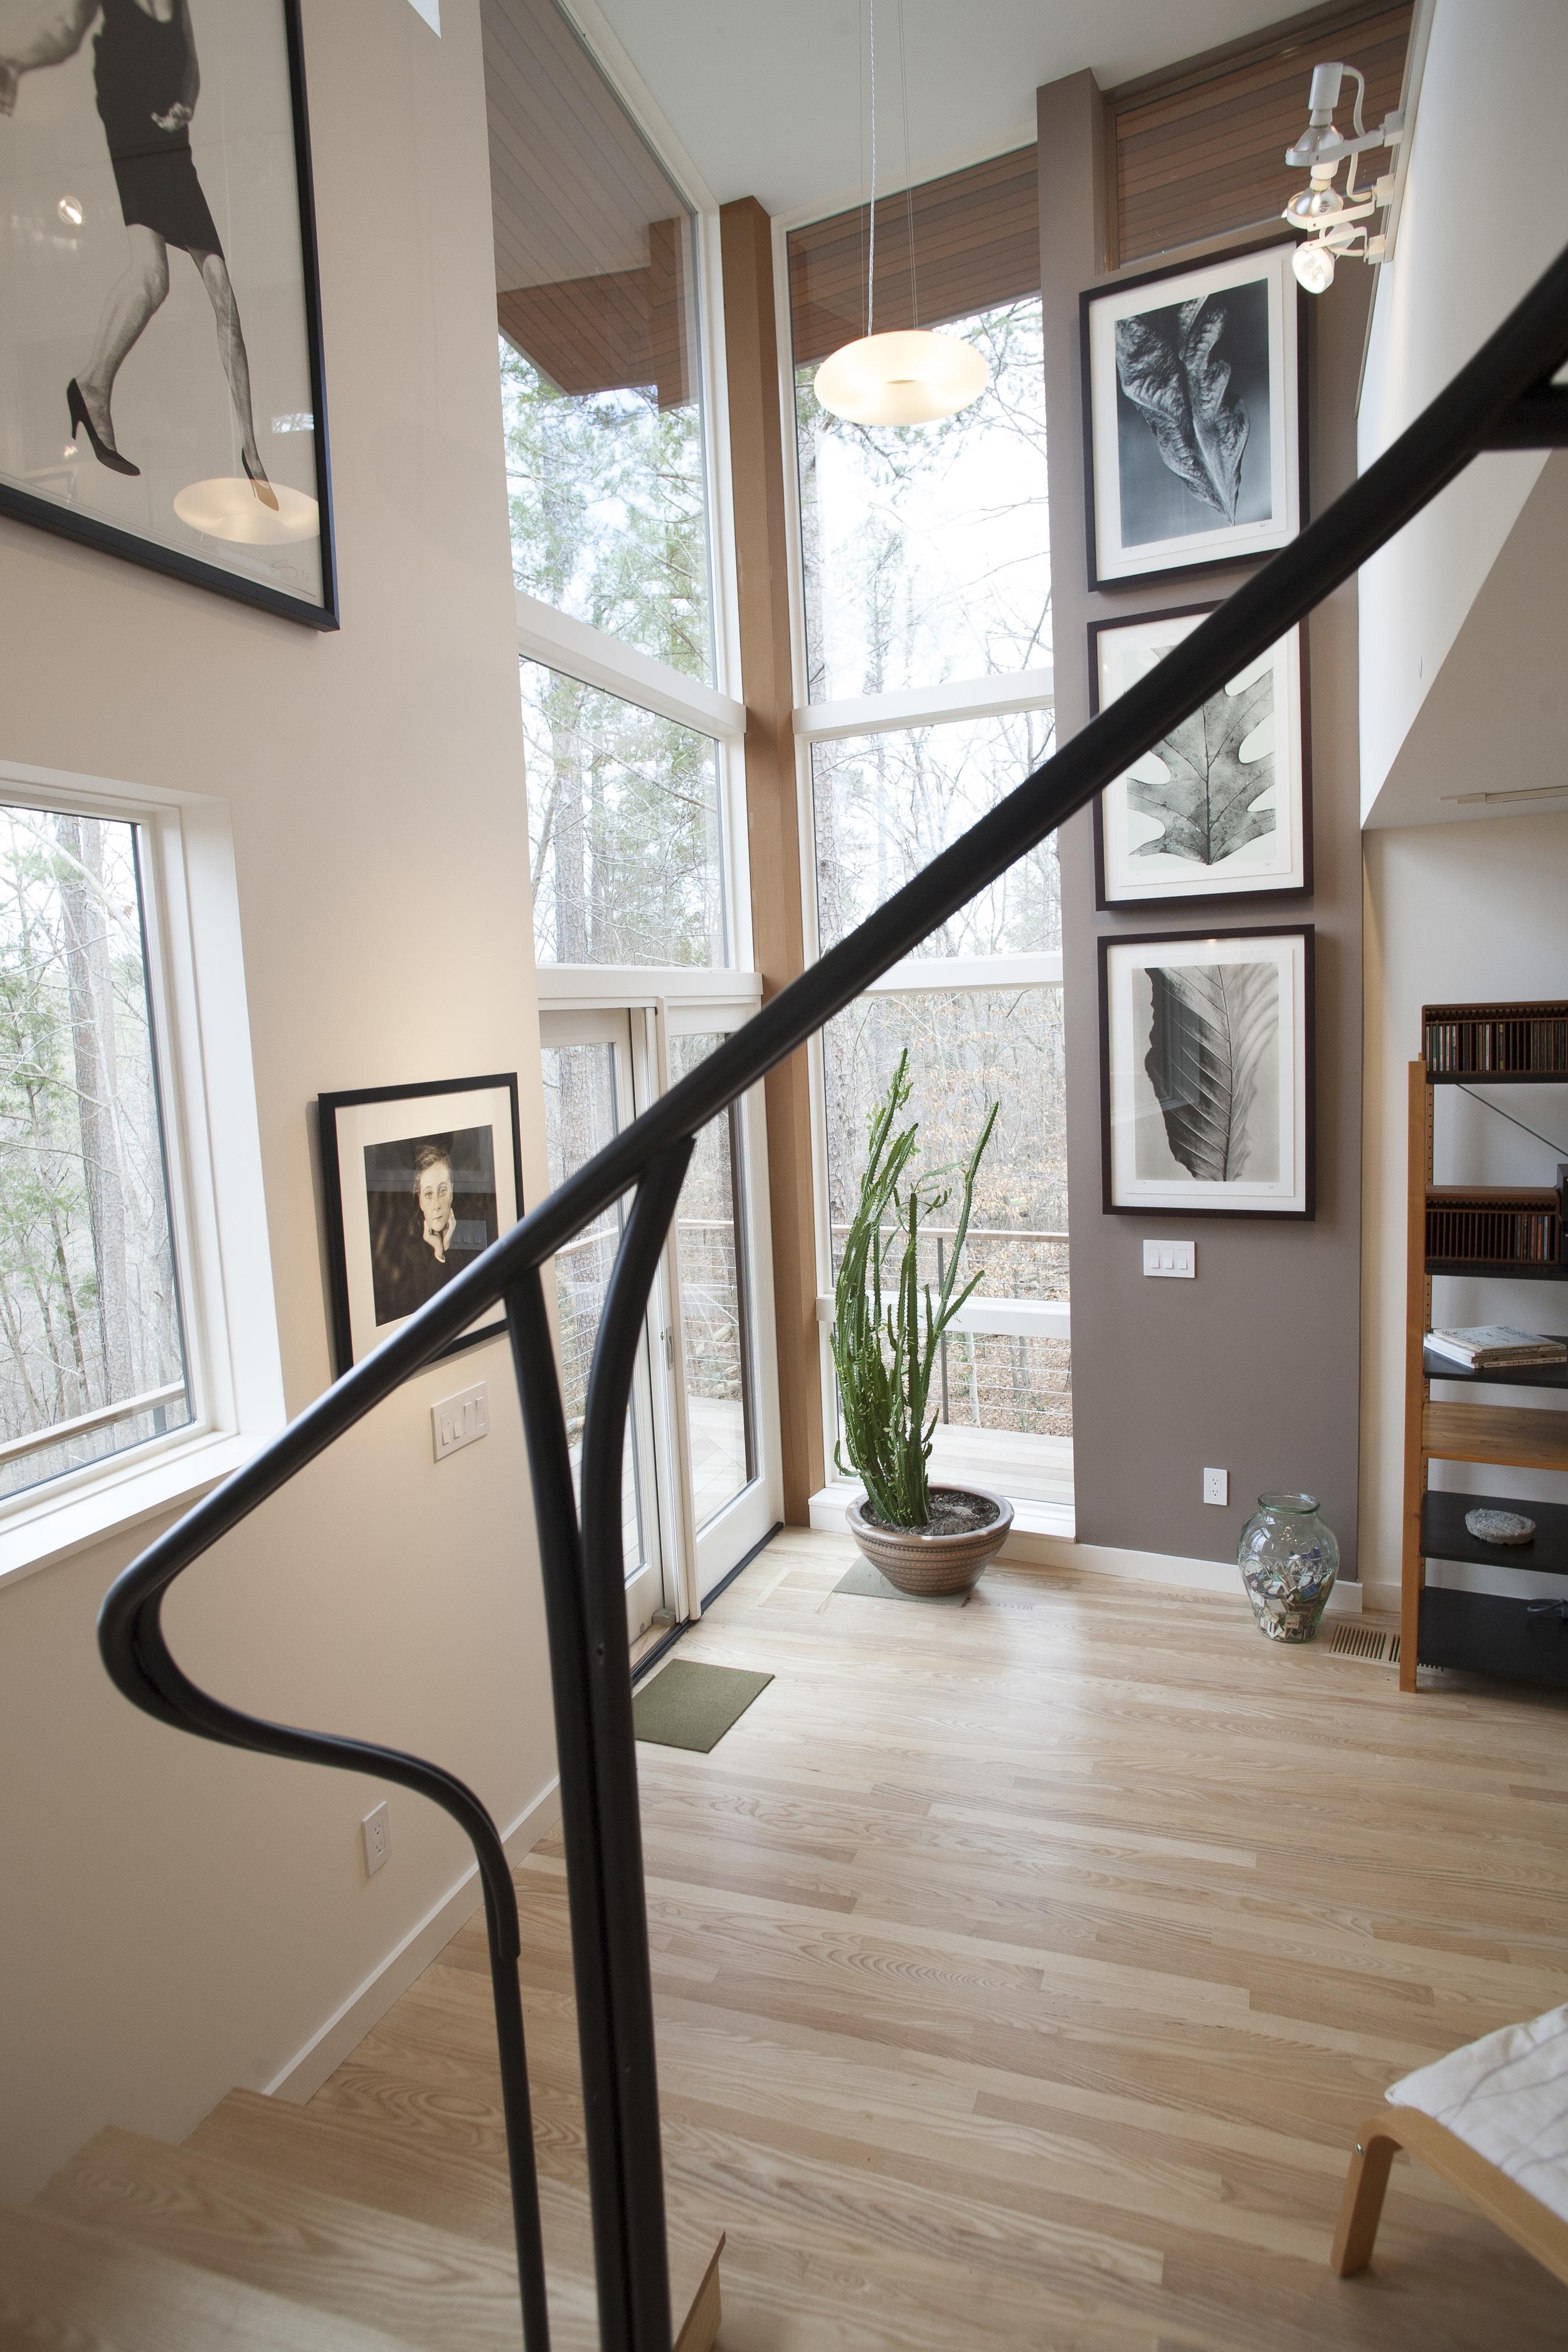 Cassilhaus Interior Artist Pod Studio from Stair Vertical Raw.jpg